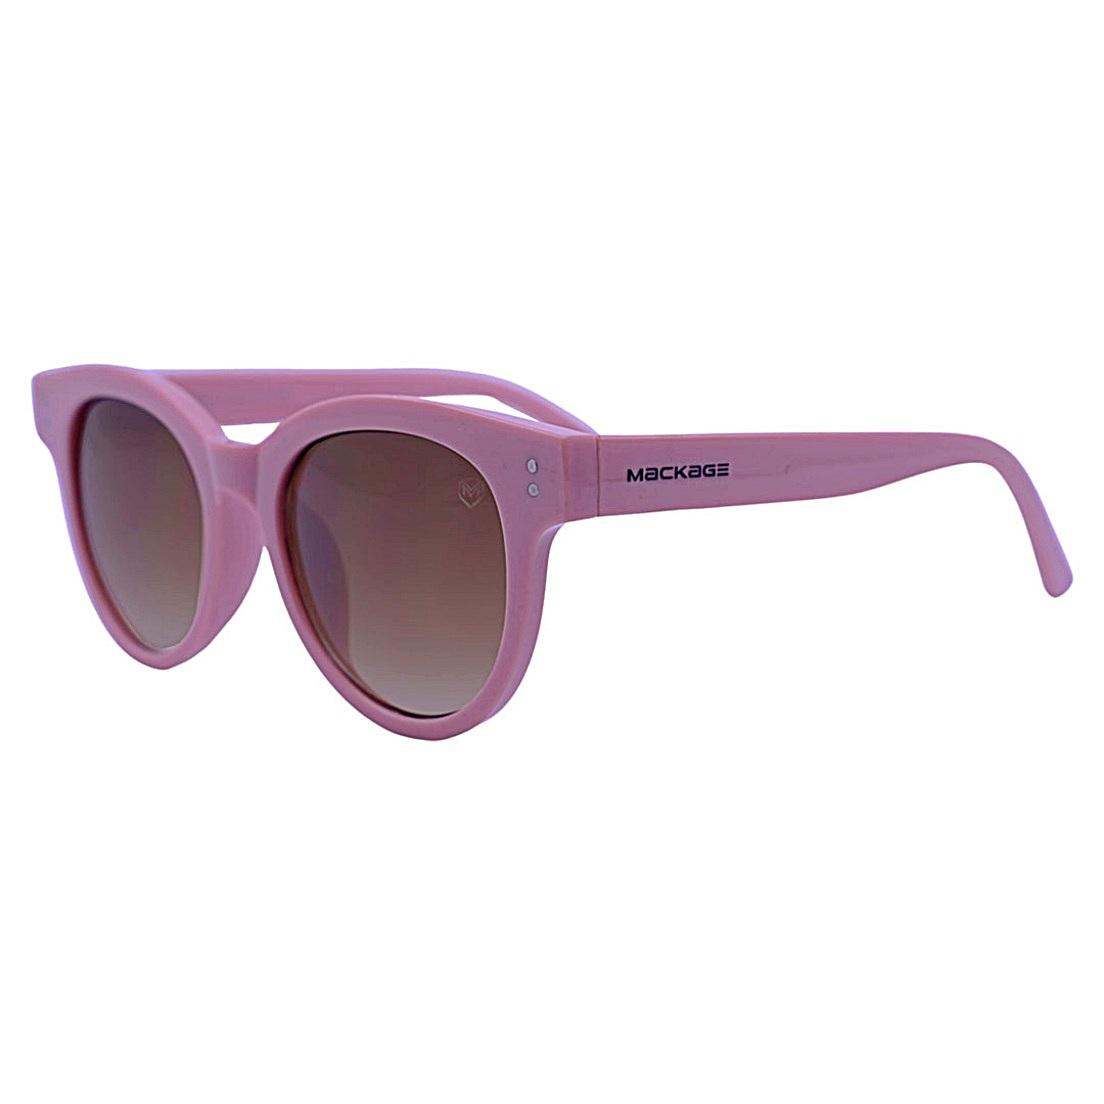 Óculos De Sol Mackage Feminino Acetato Gateado Retro - Rosa